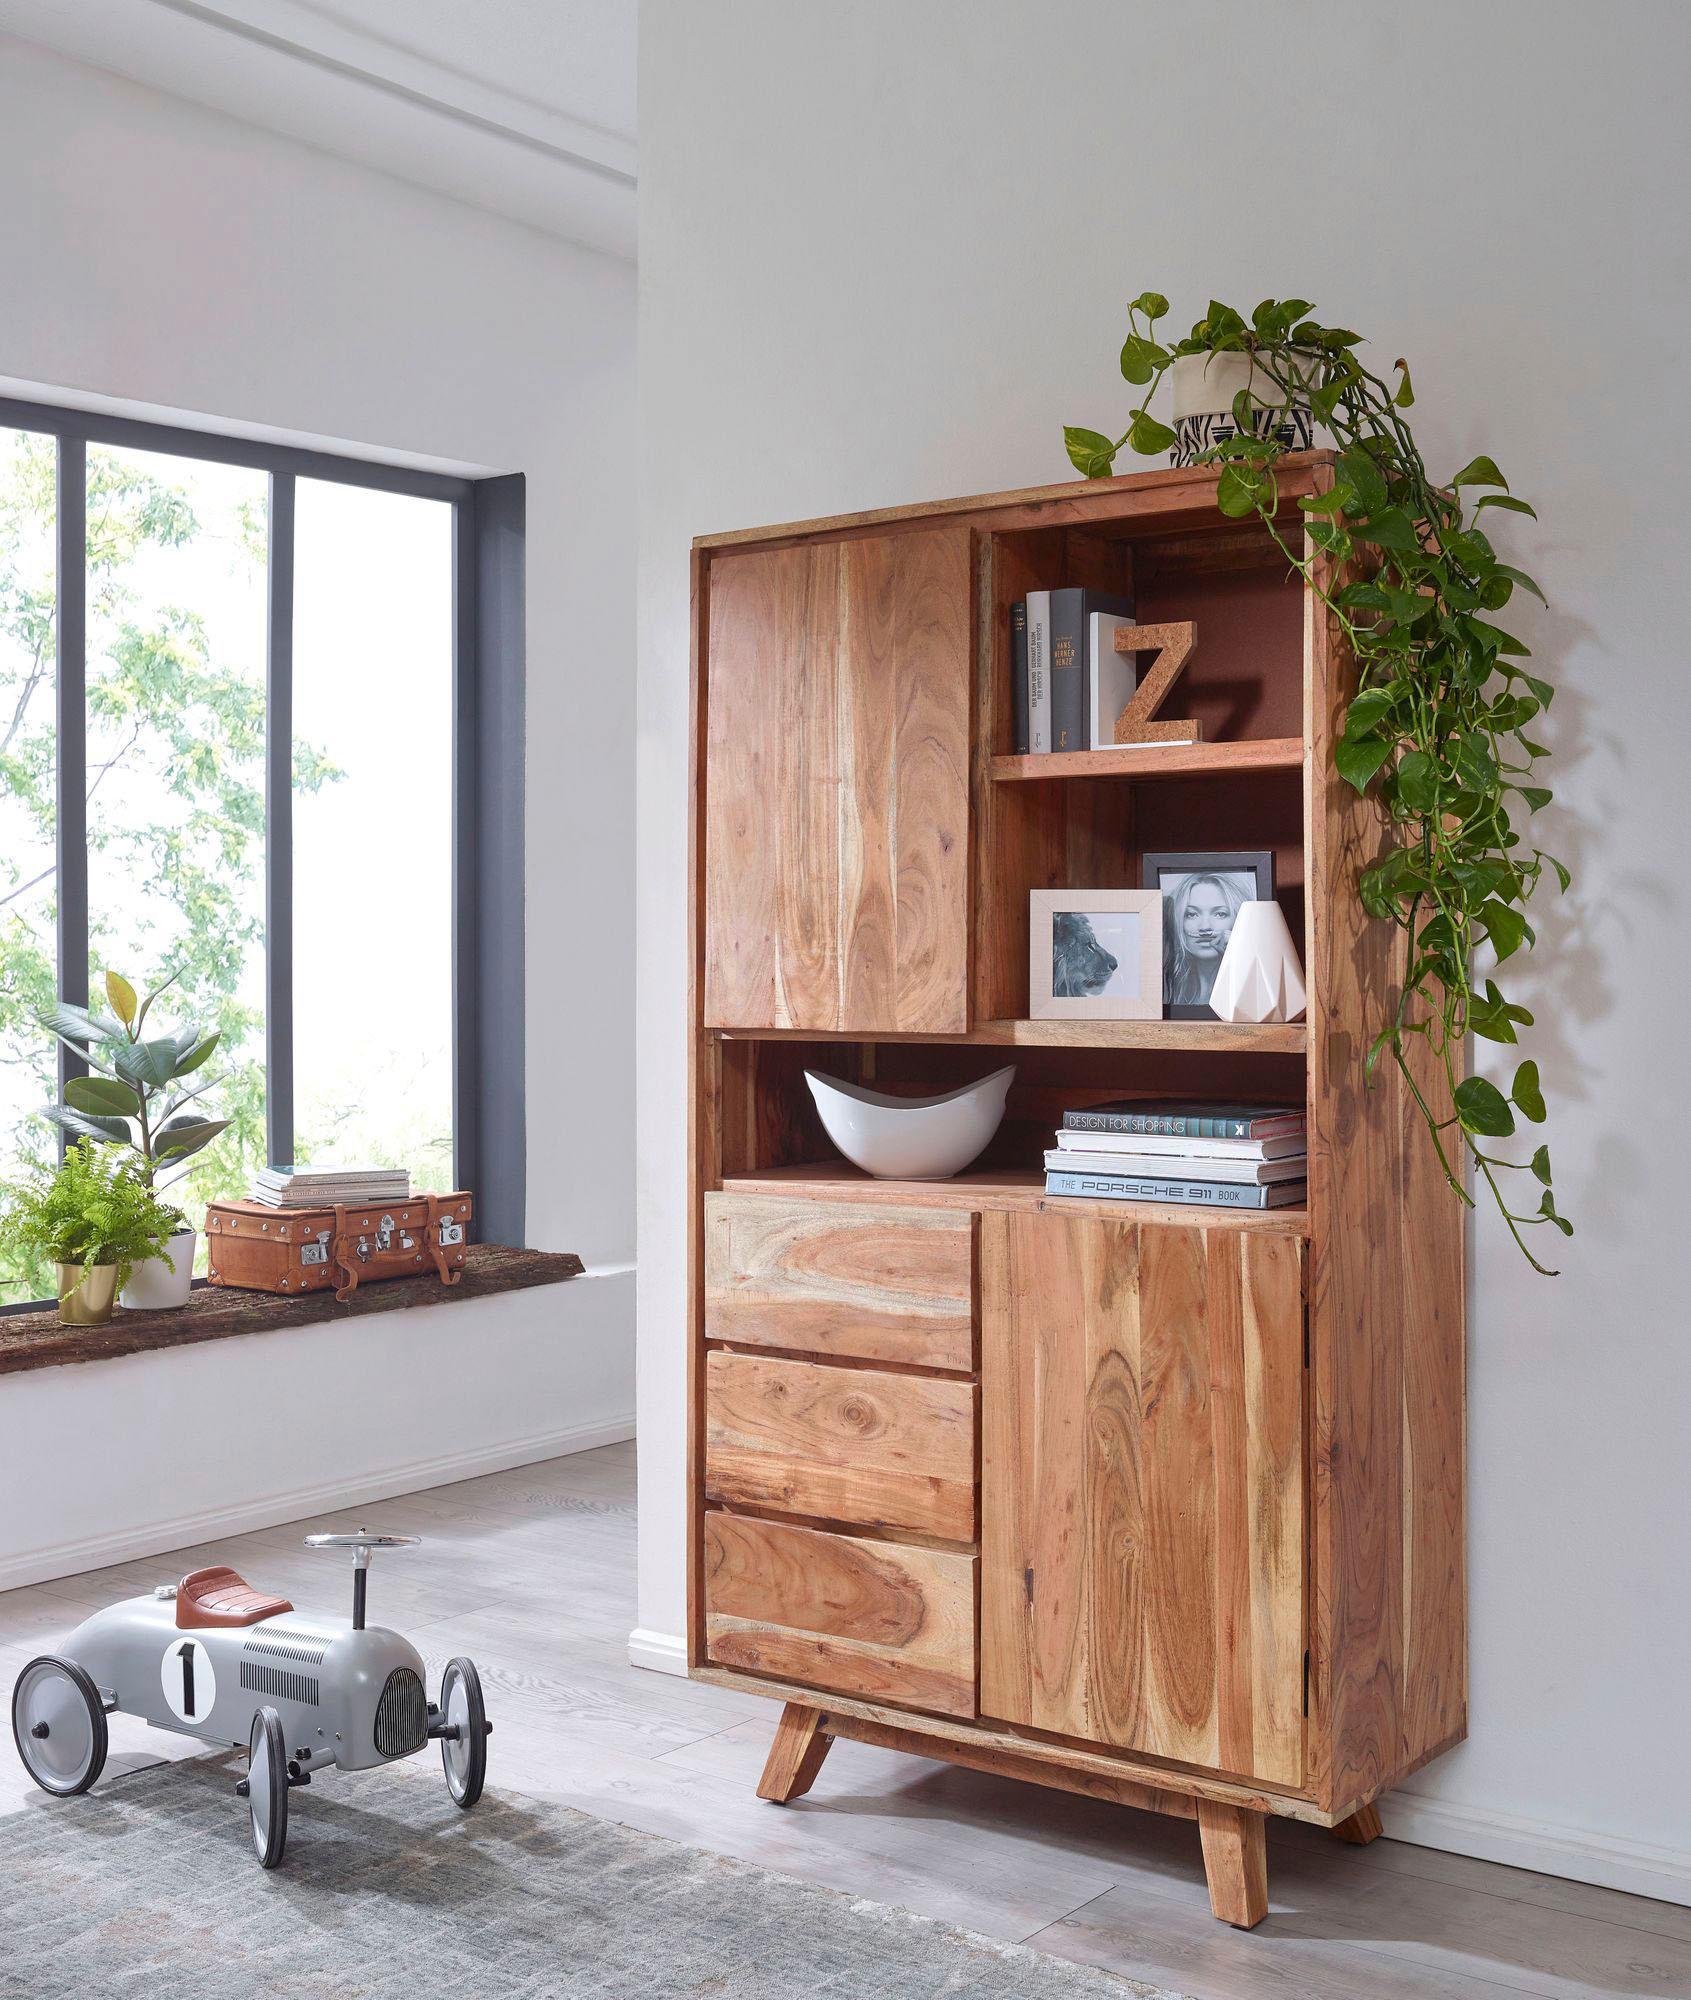 Home affaire Highboard Almira (Breite 100 cm)